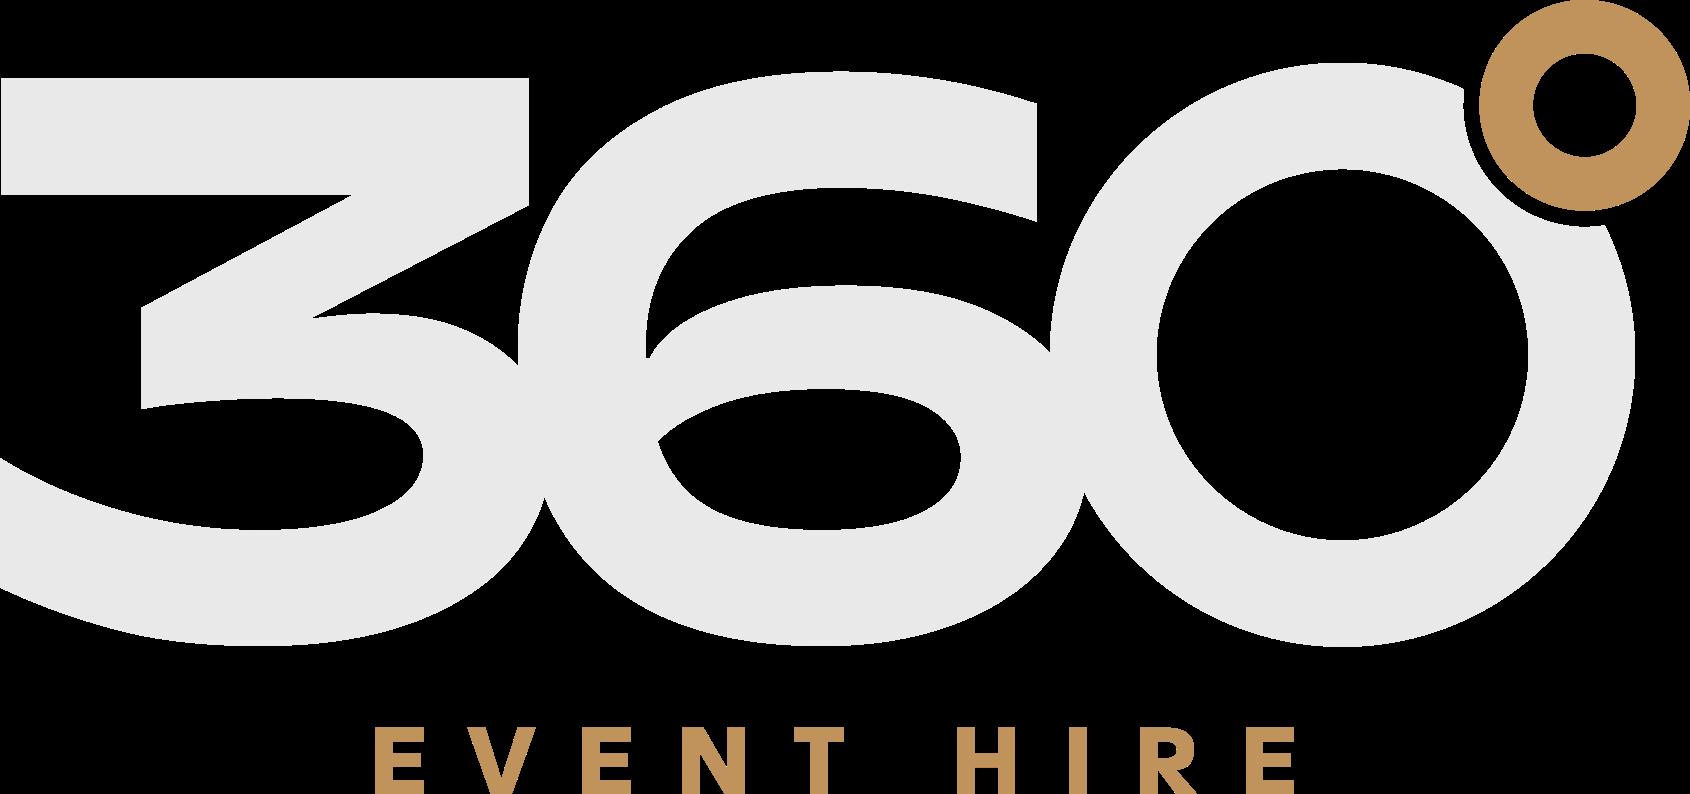 360 Event Hire Scotland